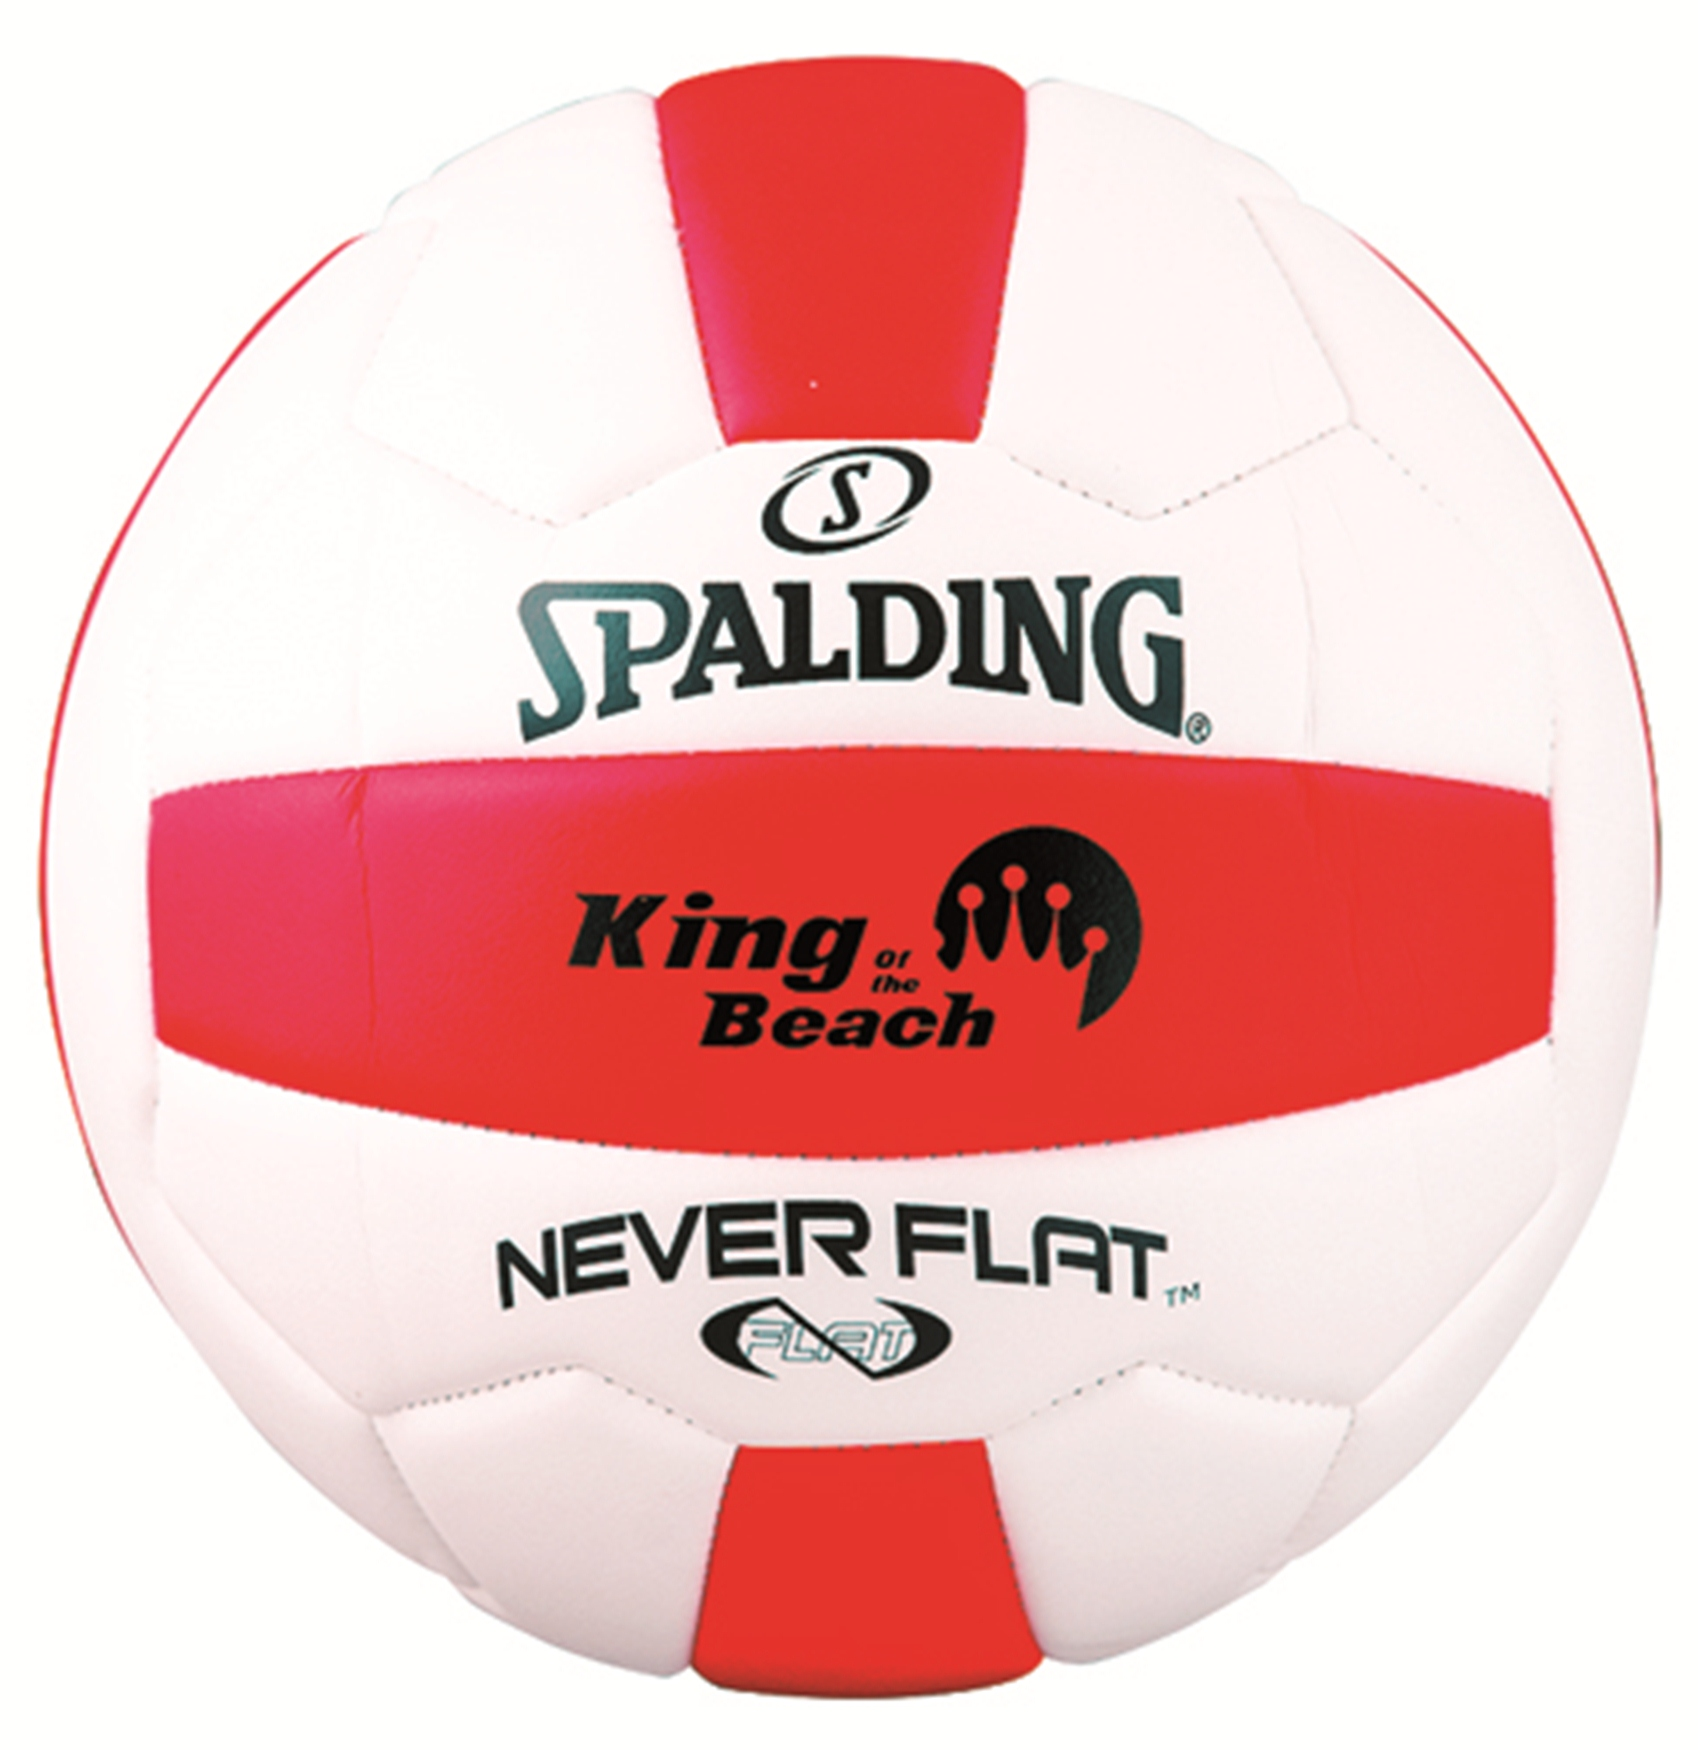 Spalding Neverflat King Of The Beach Eva Smooth Volleyball Volleyballs Beach Volleyball Spalding